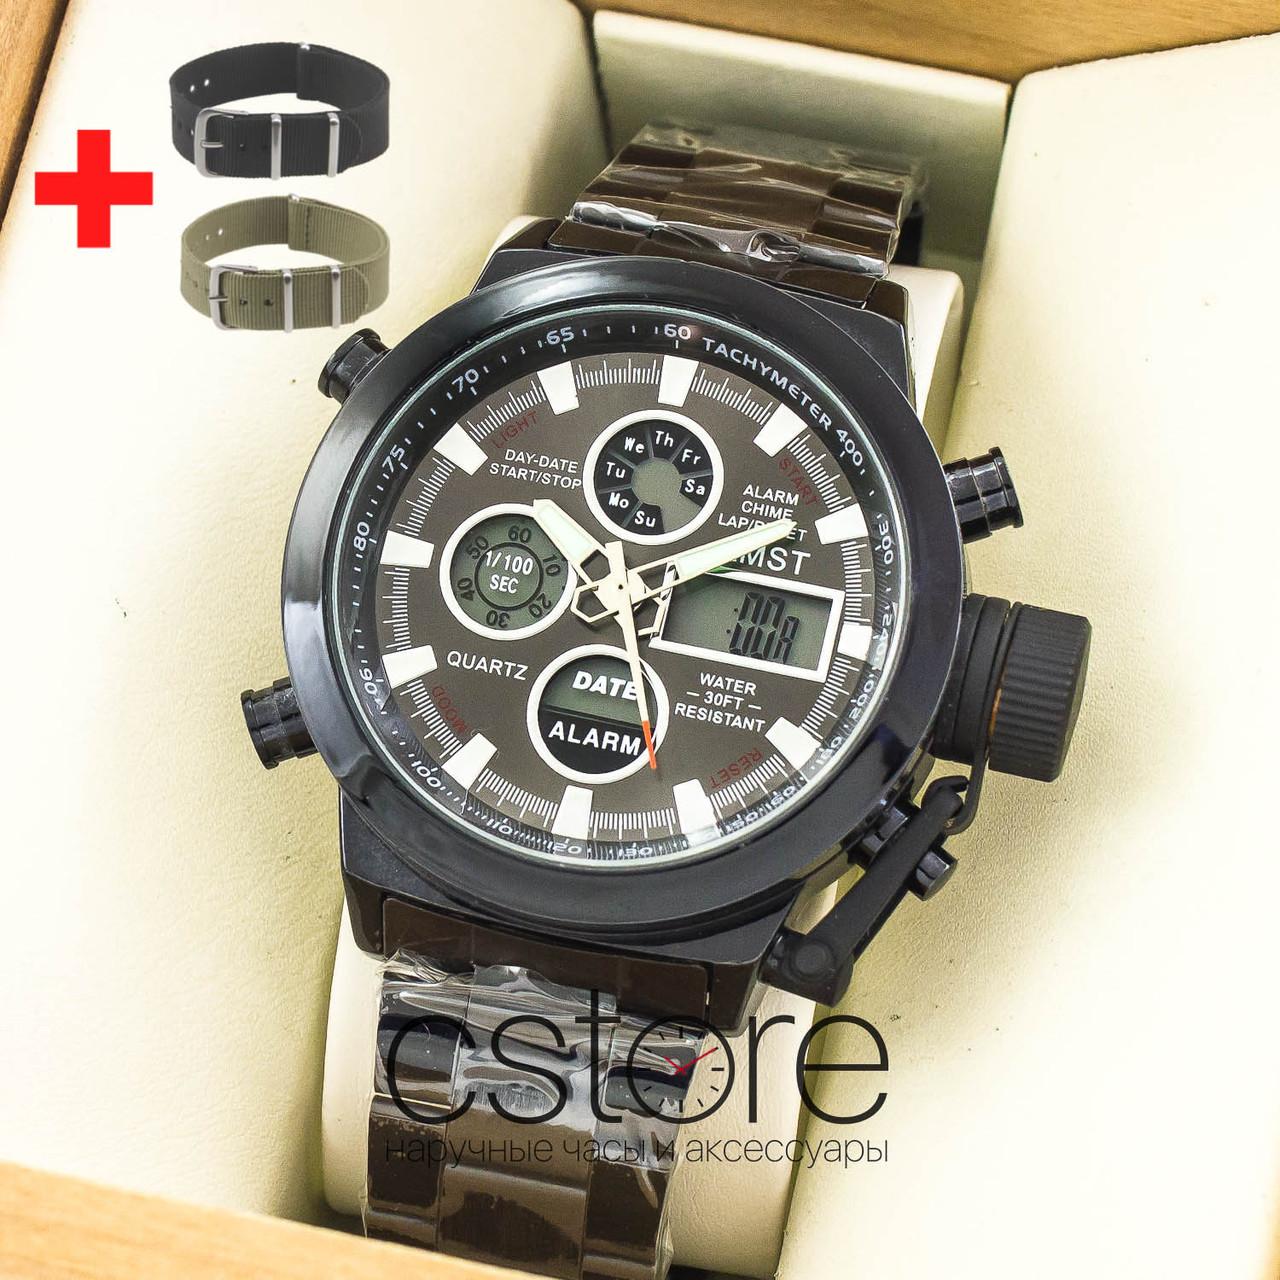 9b58661ffd55 Мужские армейские наручные часы Amst black black am3003 на браслете (07482)